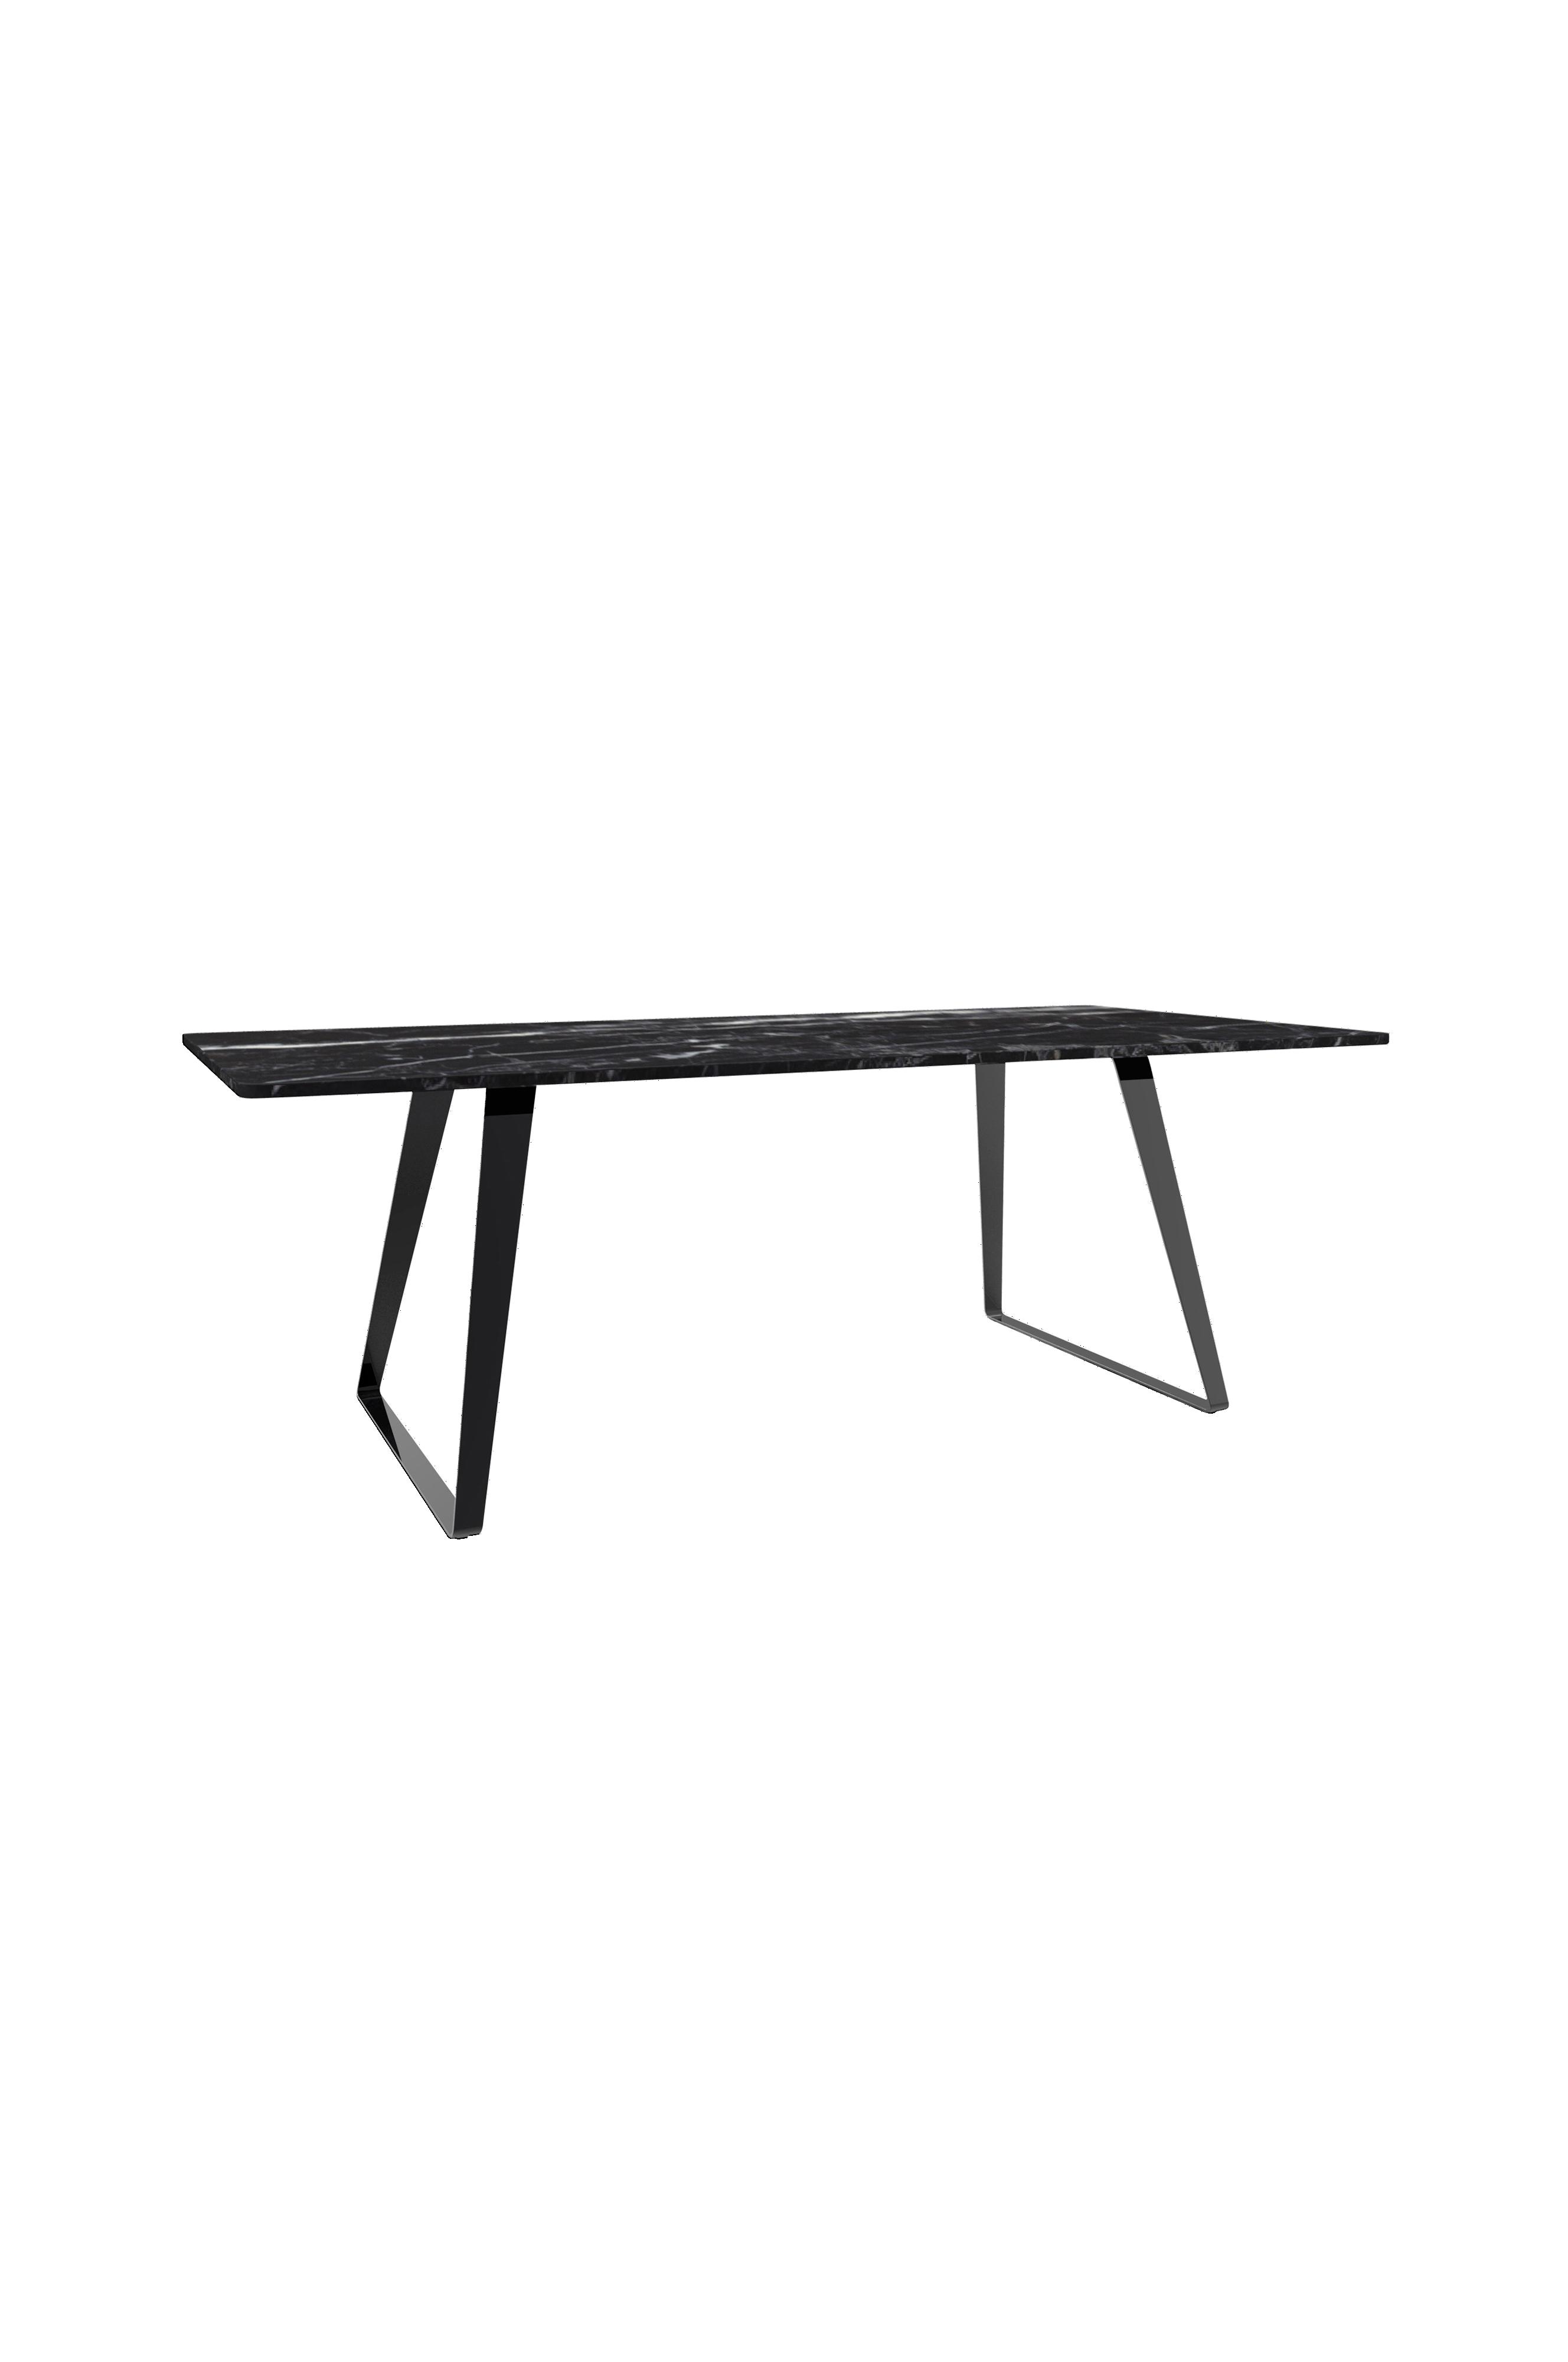 Matbord, Espolla 90x200 cm – NORDFORM